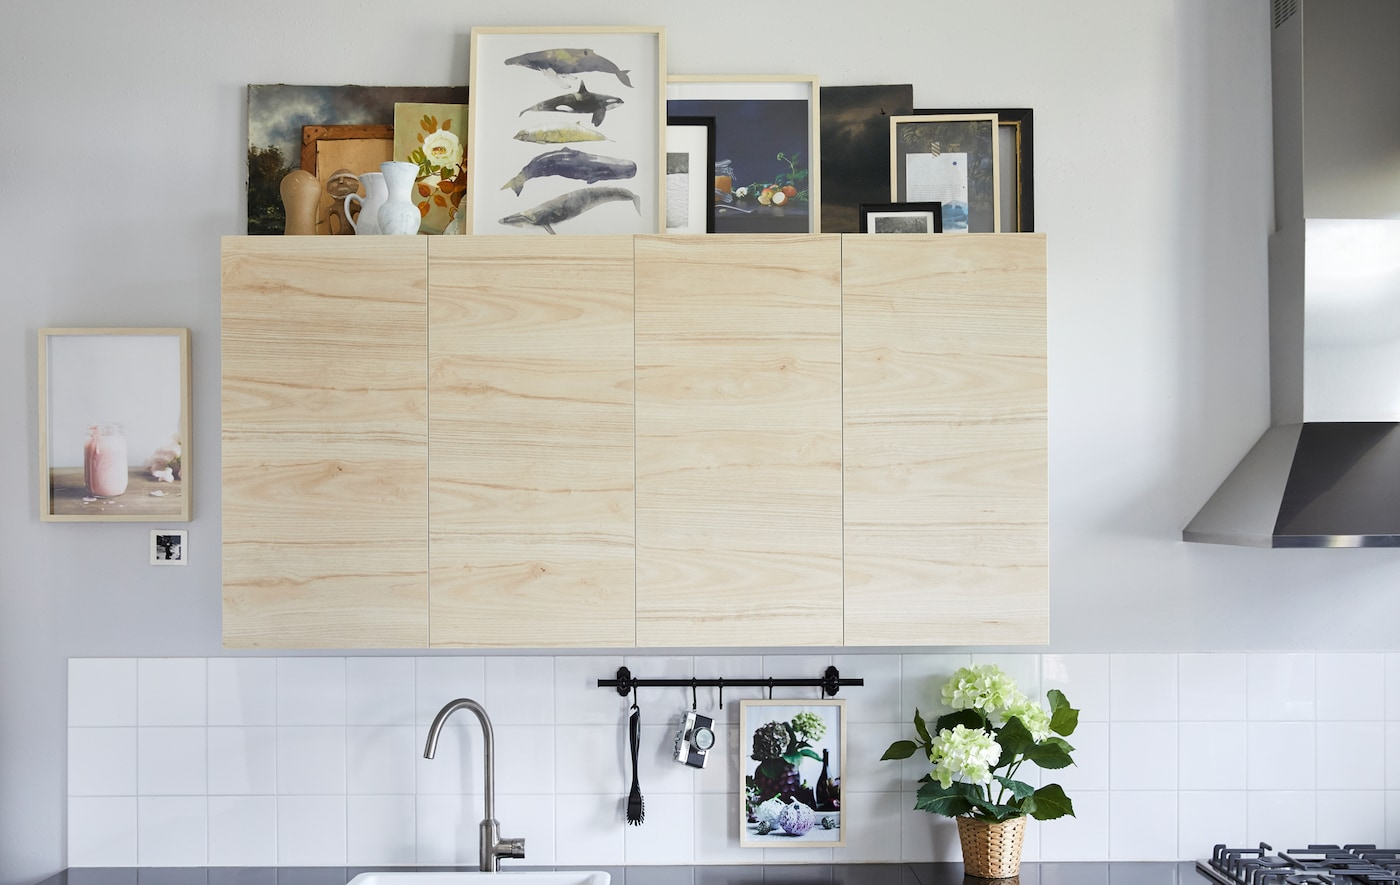 k chenschr nke dekorieren stilvolle ideen ikea. Black Bedroom Furniture Sets. Home Design Ideas